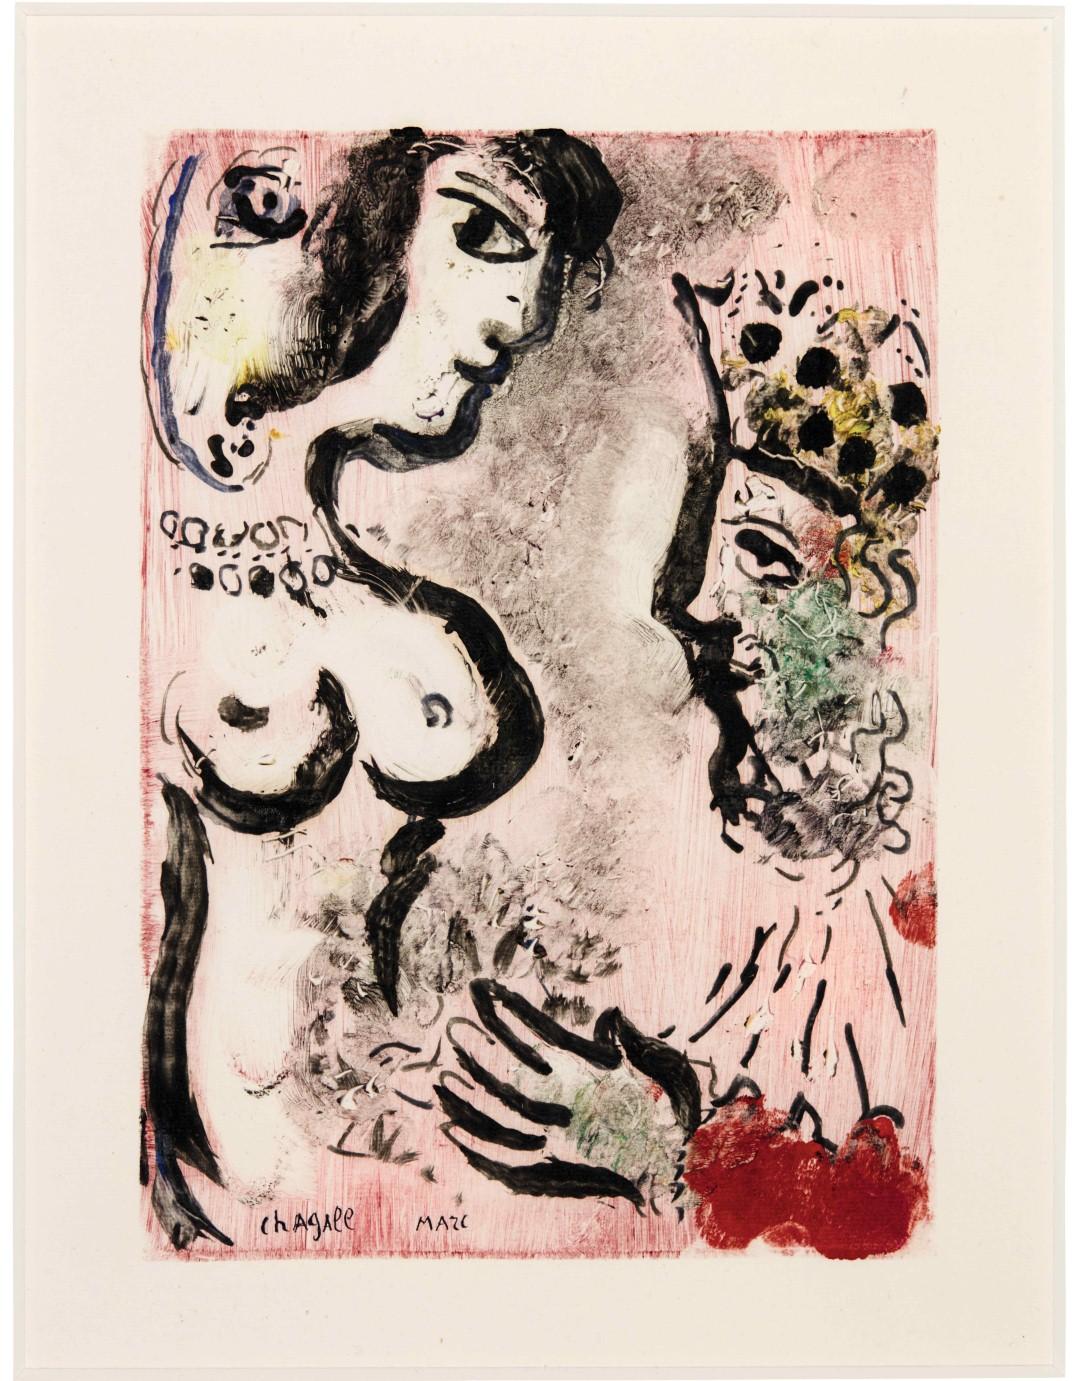 Marc Chagall. Le Bouffon, 1965, monotype, 38,5×30 cm